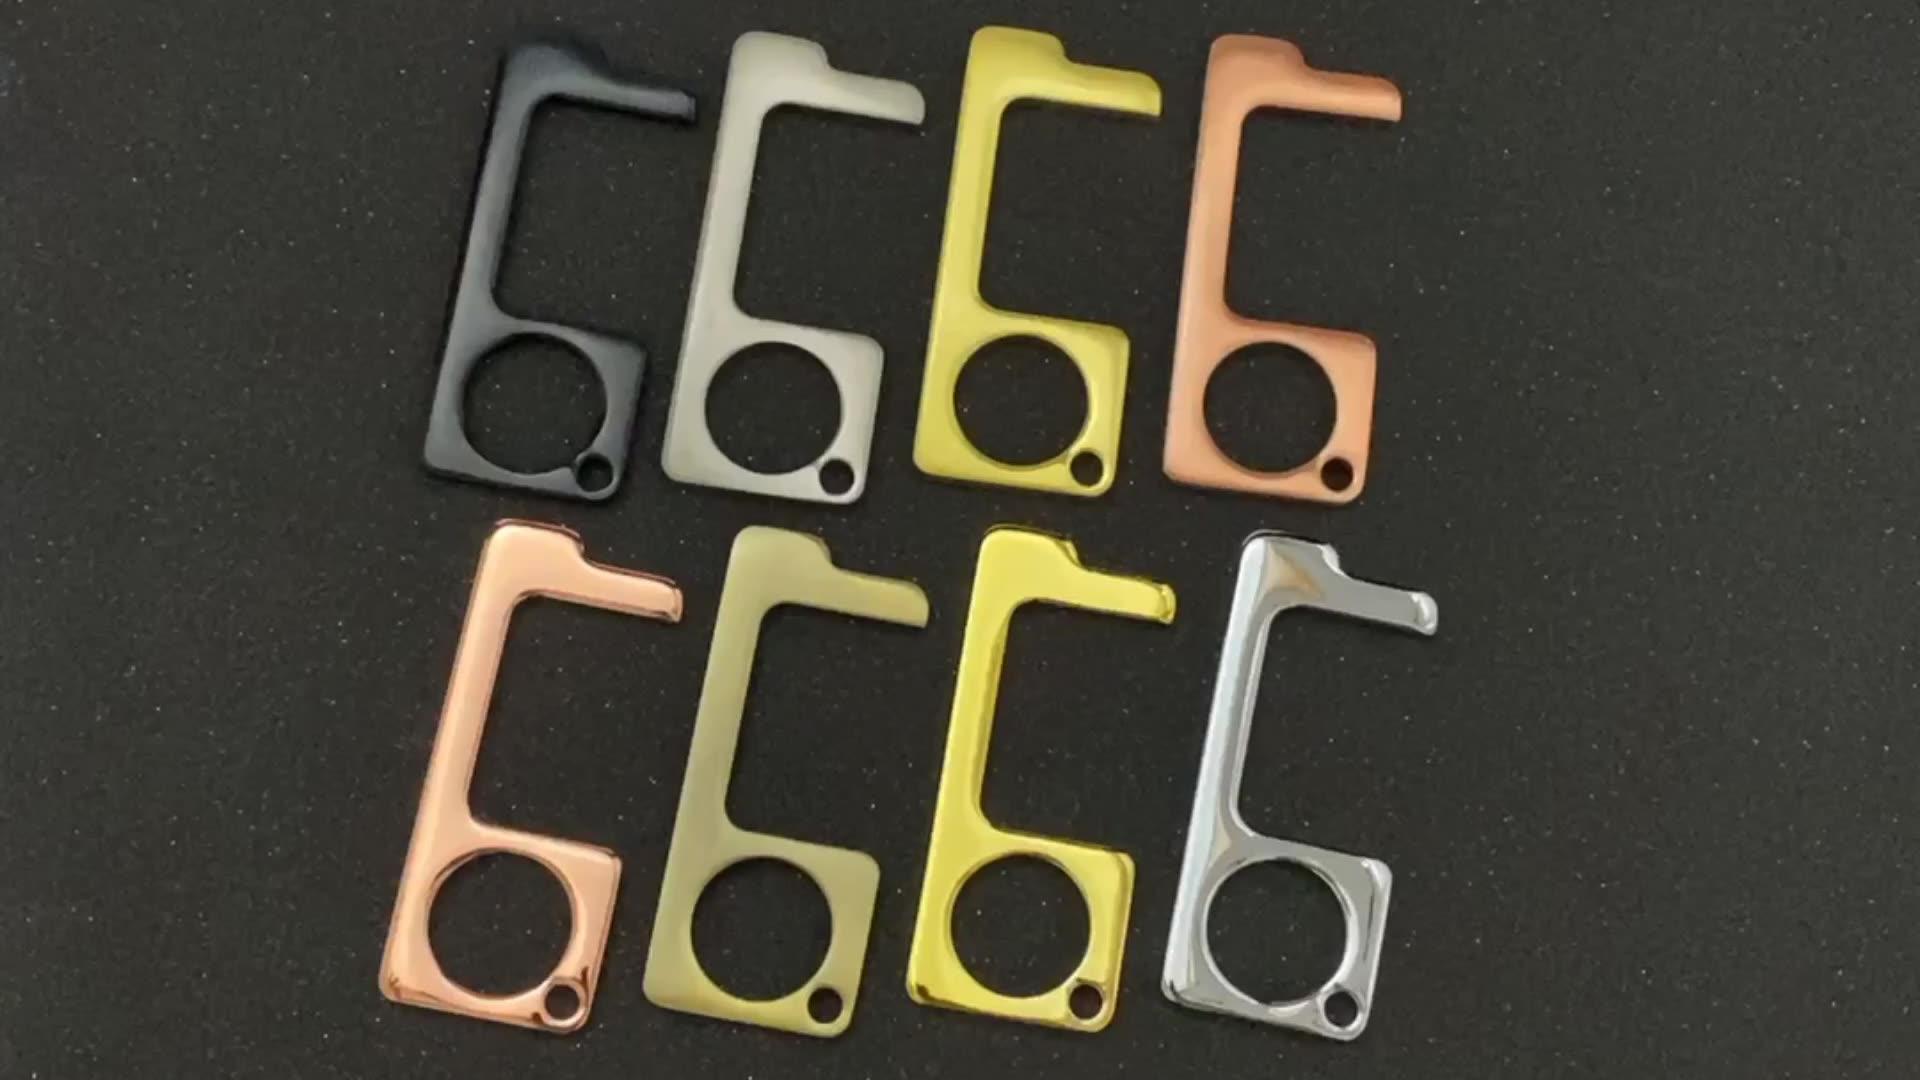 Özel boyut 72x30mm mat altın kaplama metal touchless sıhhi temassız kapı açacağı